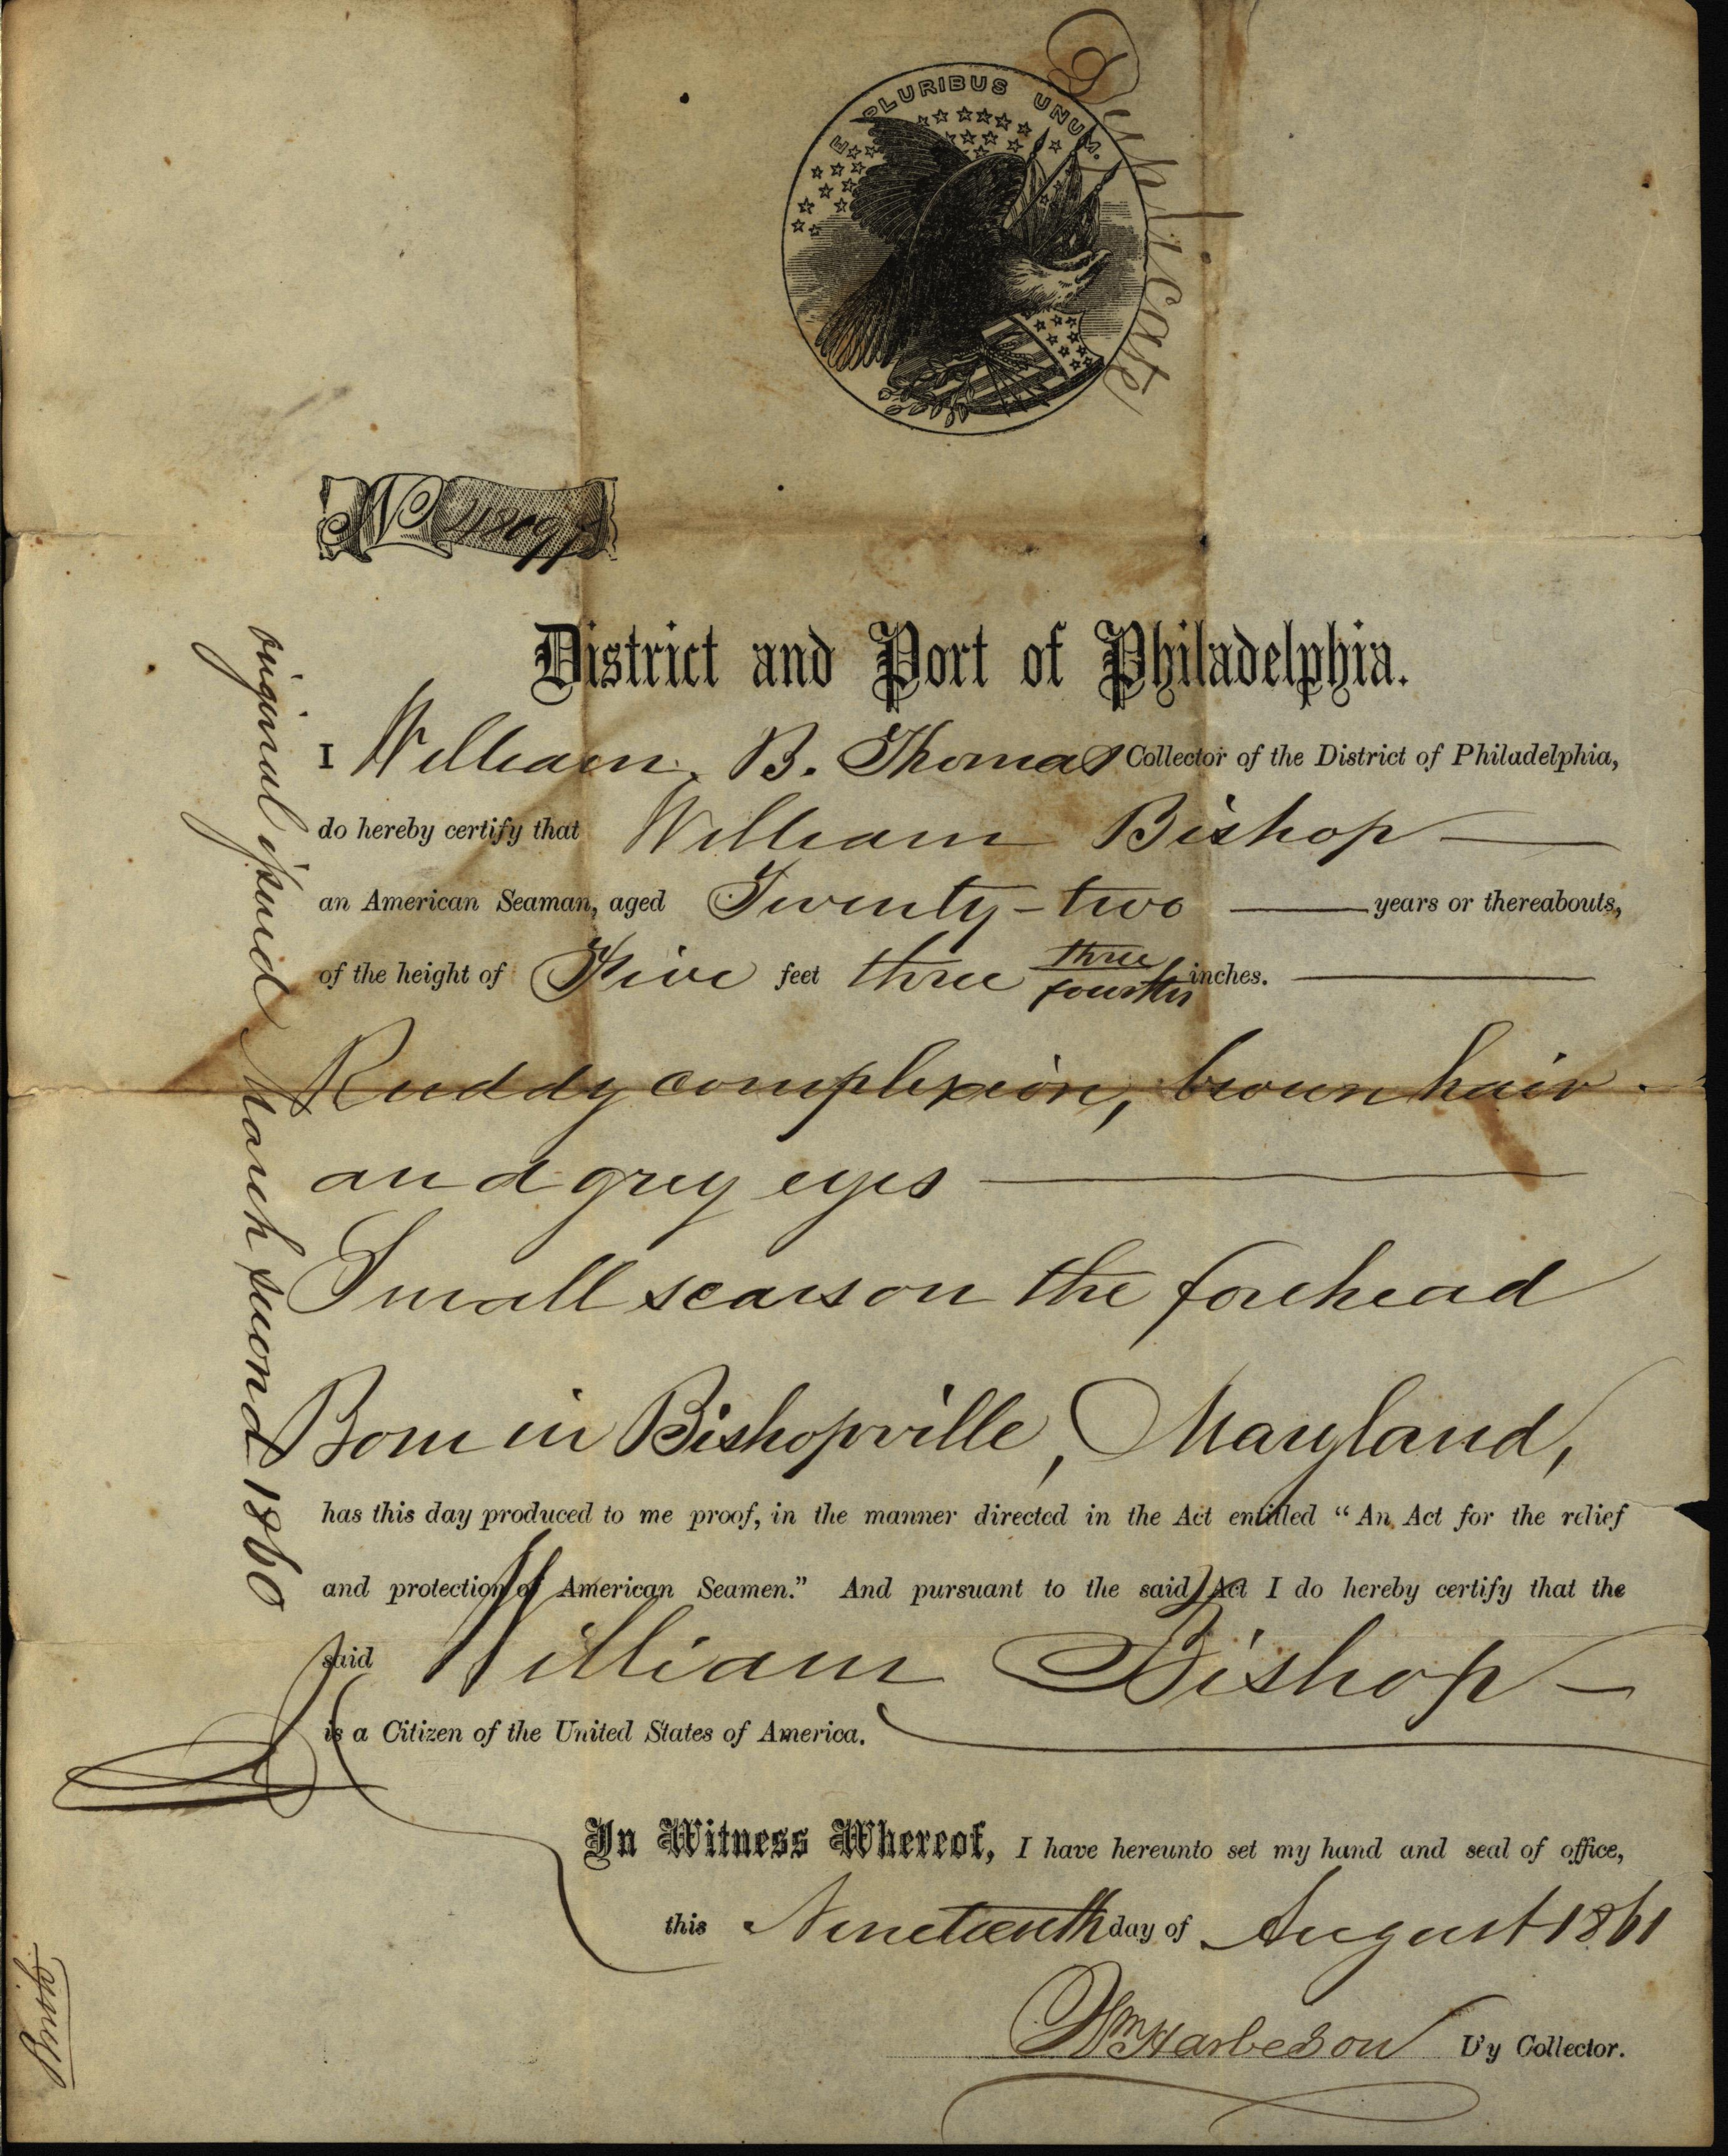 William B. Thomas, seaman's certificate of American citizenship, 1861